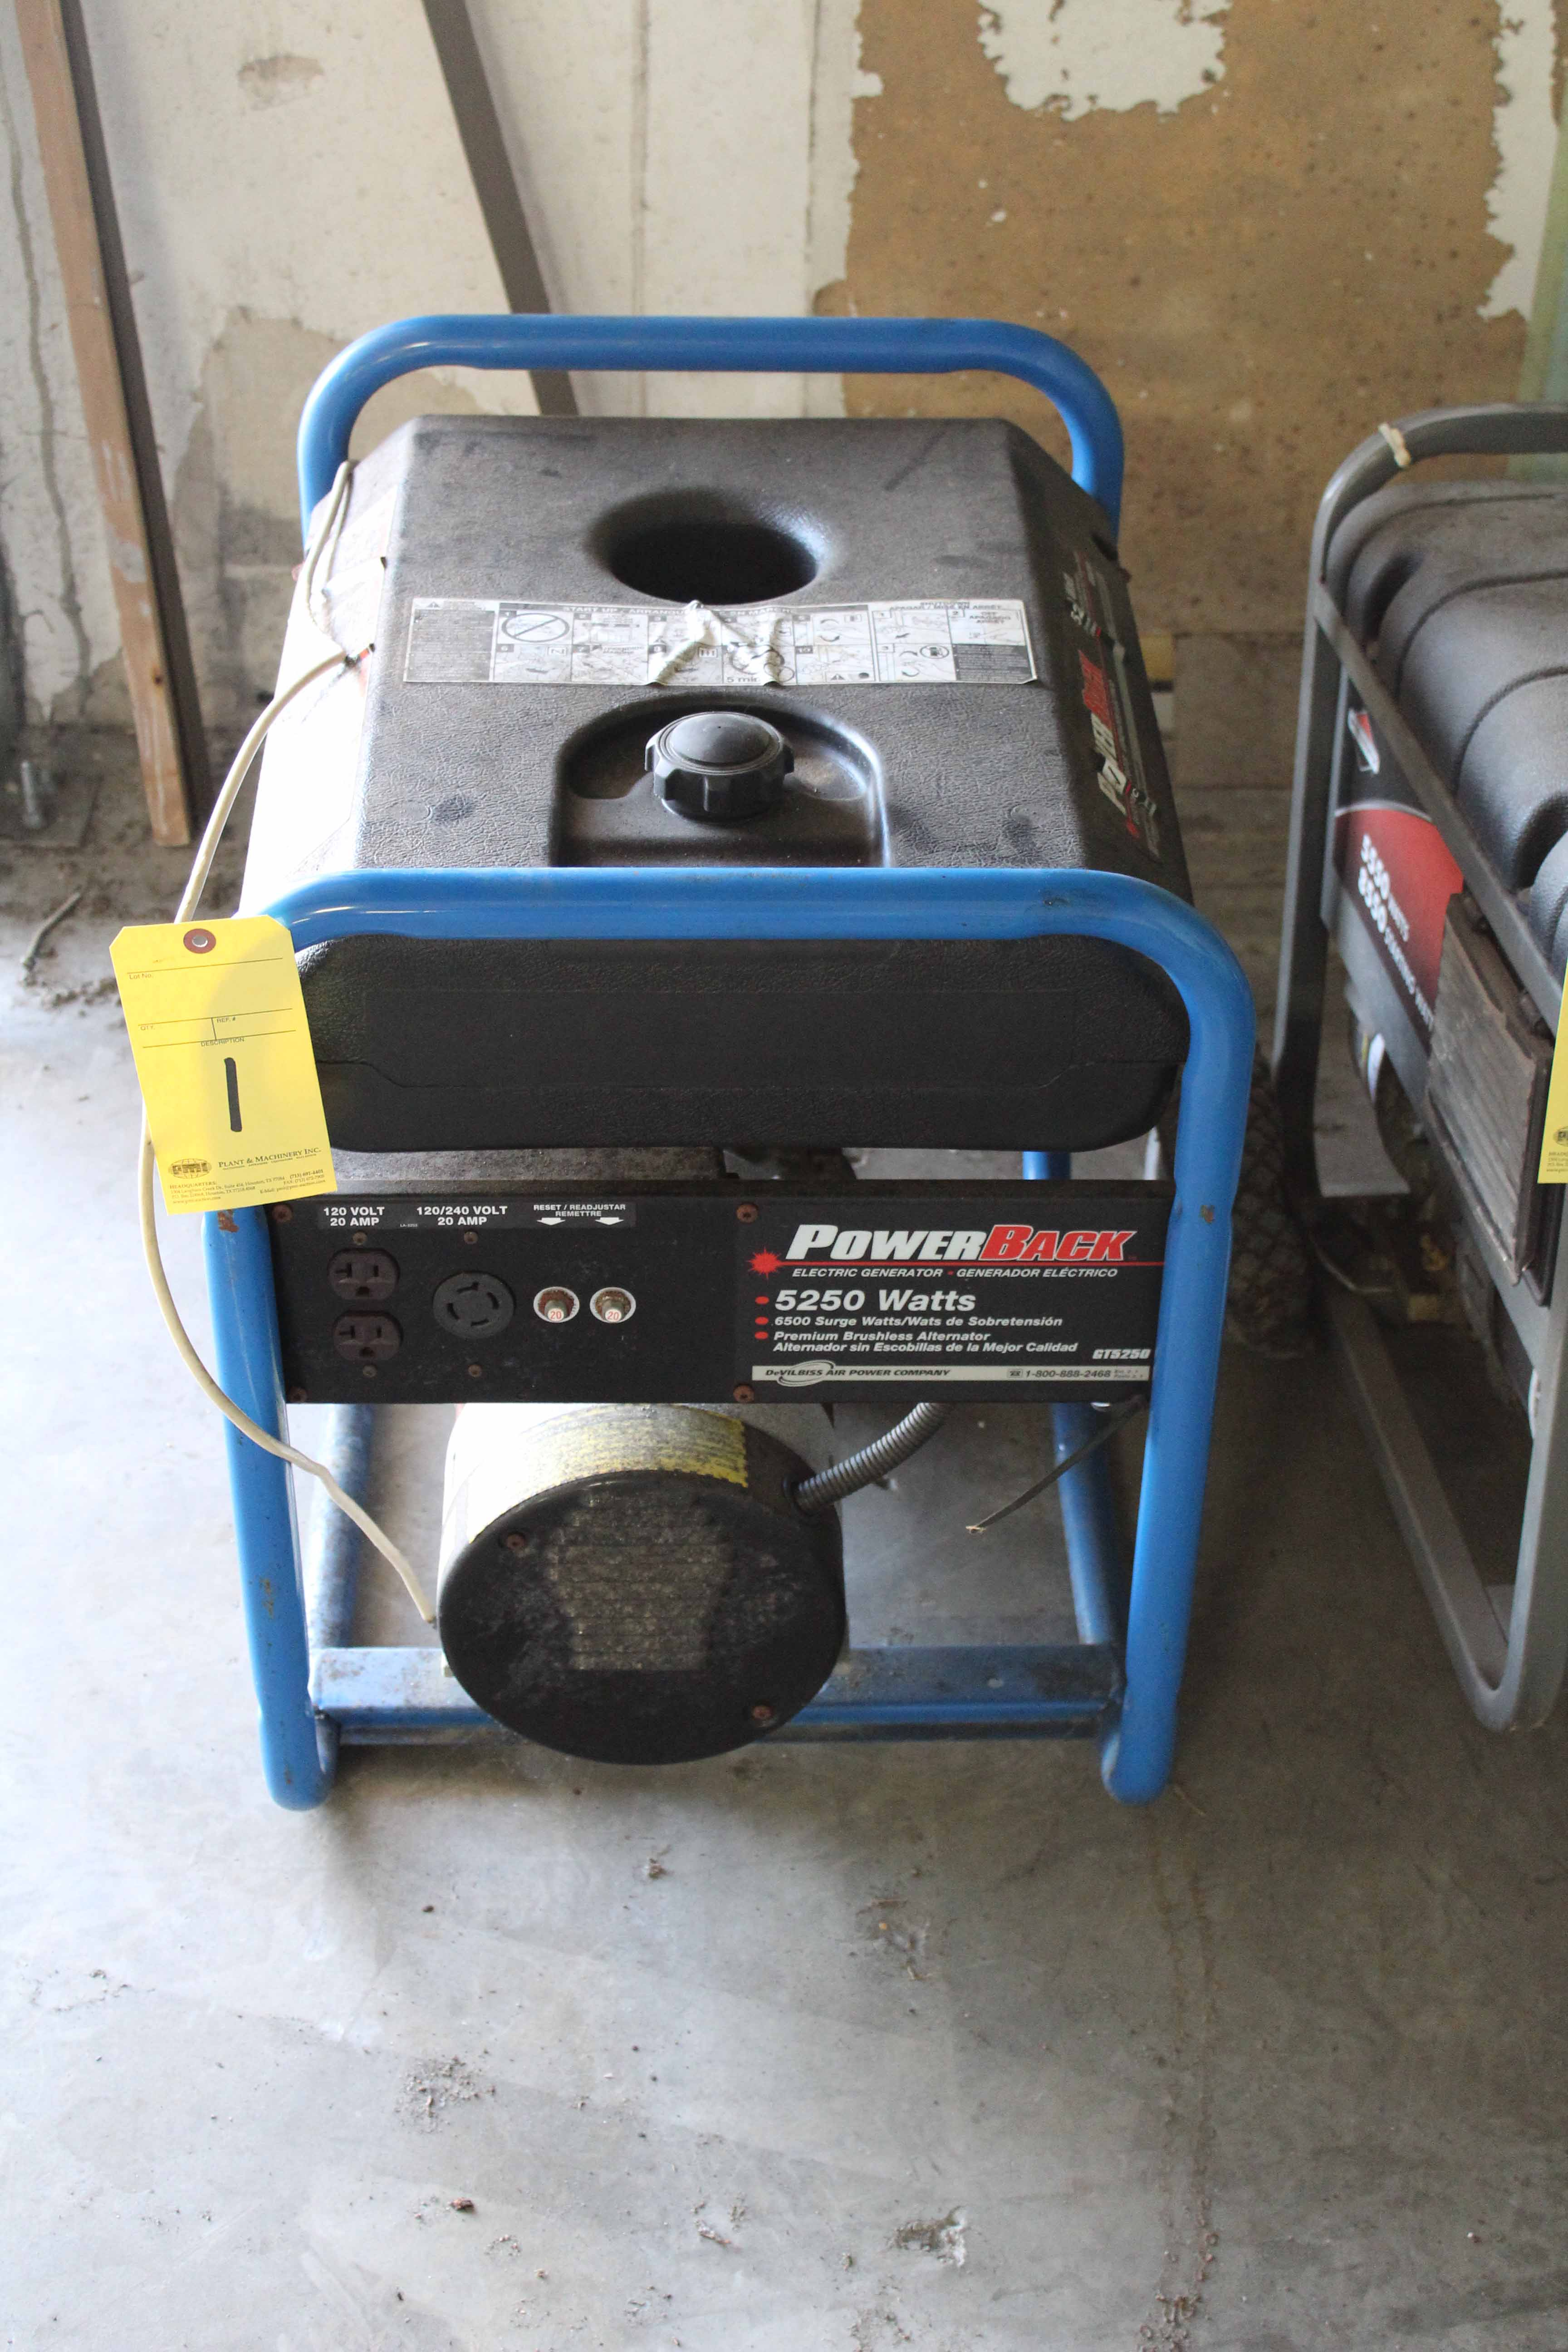 Lot 1 - PORTABLE GENERATOR, POWERBACK, 5,250 watt, gasoline pwrd.